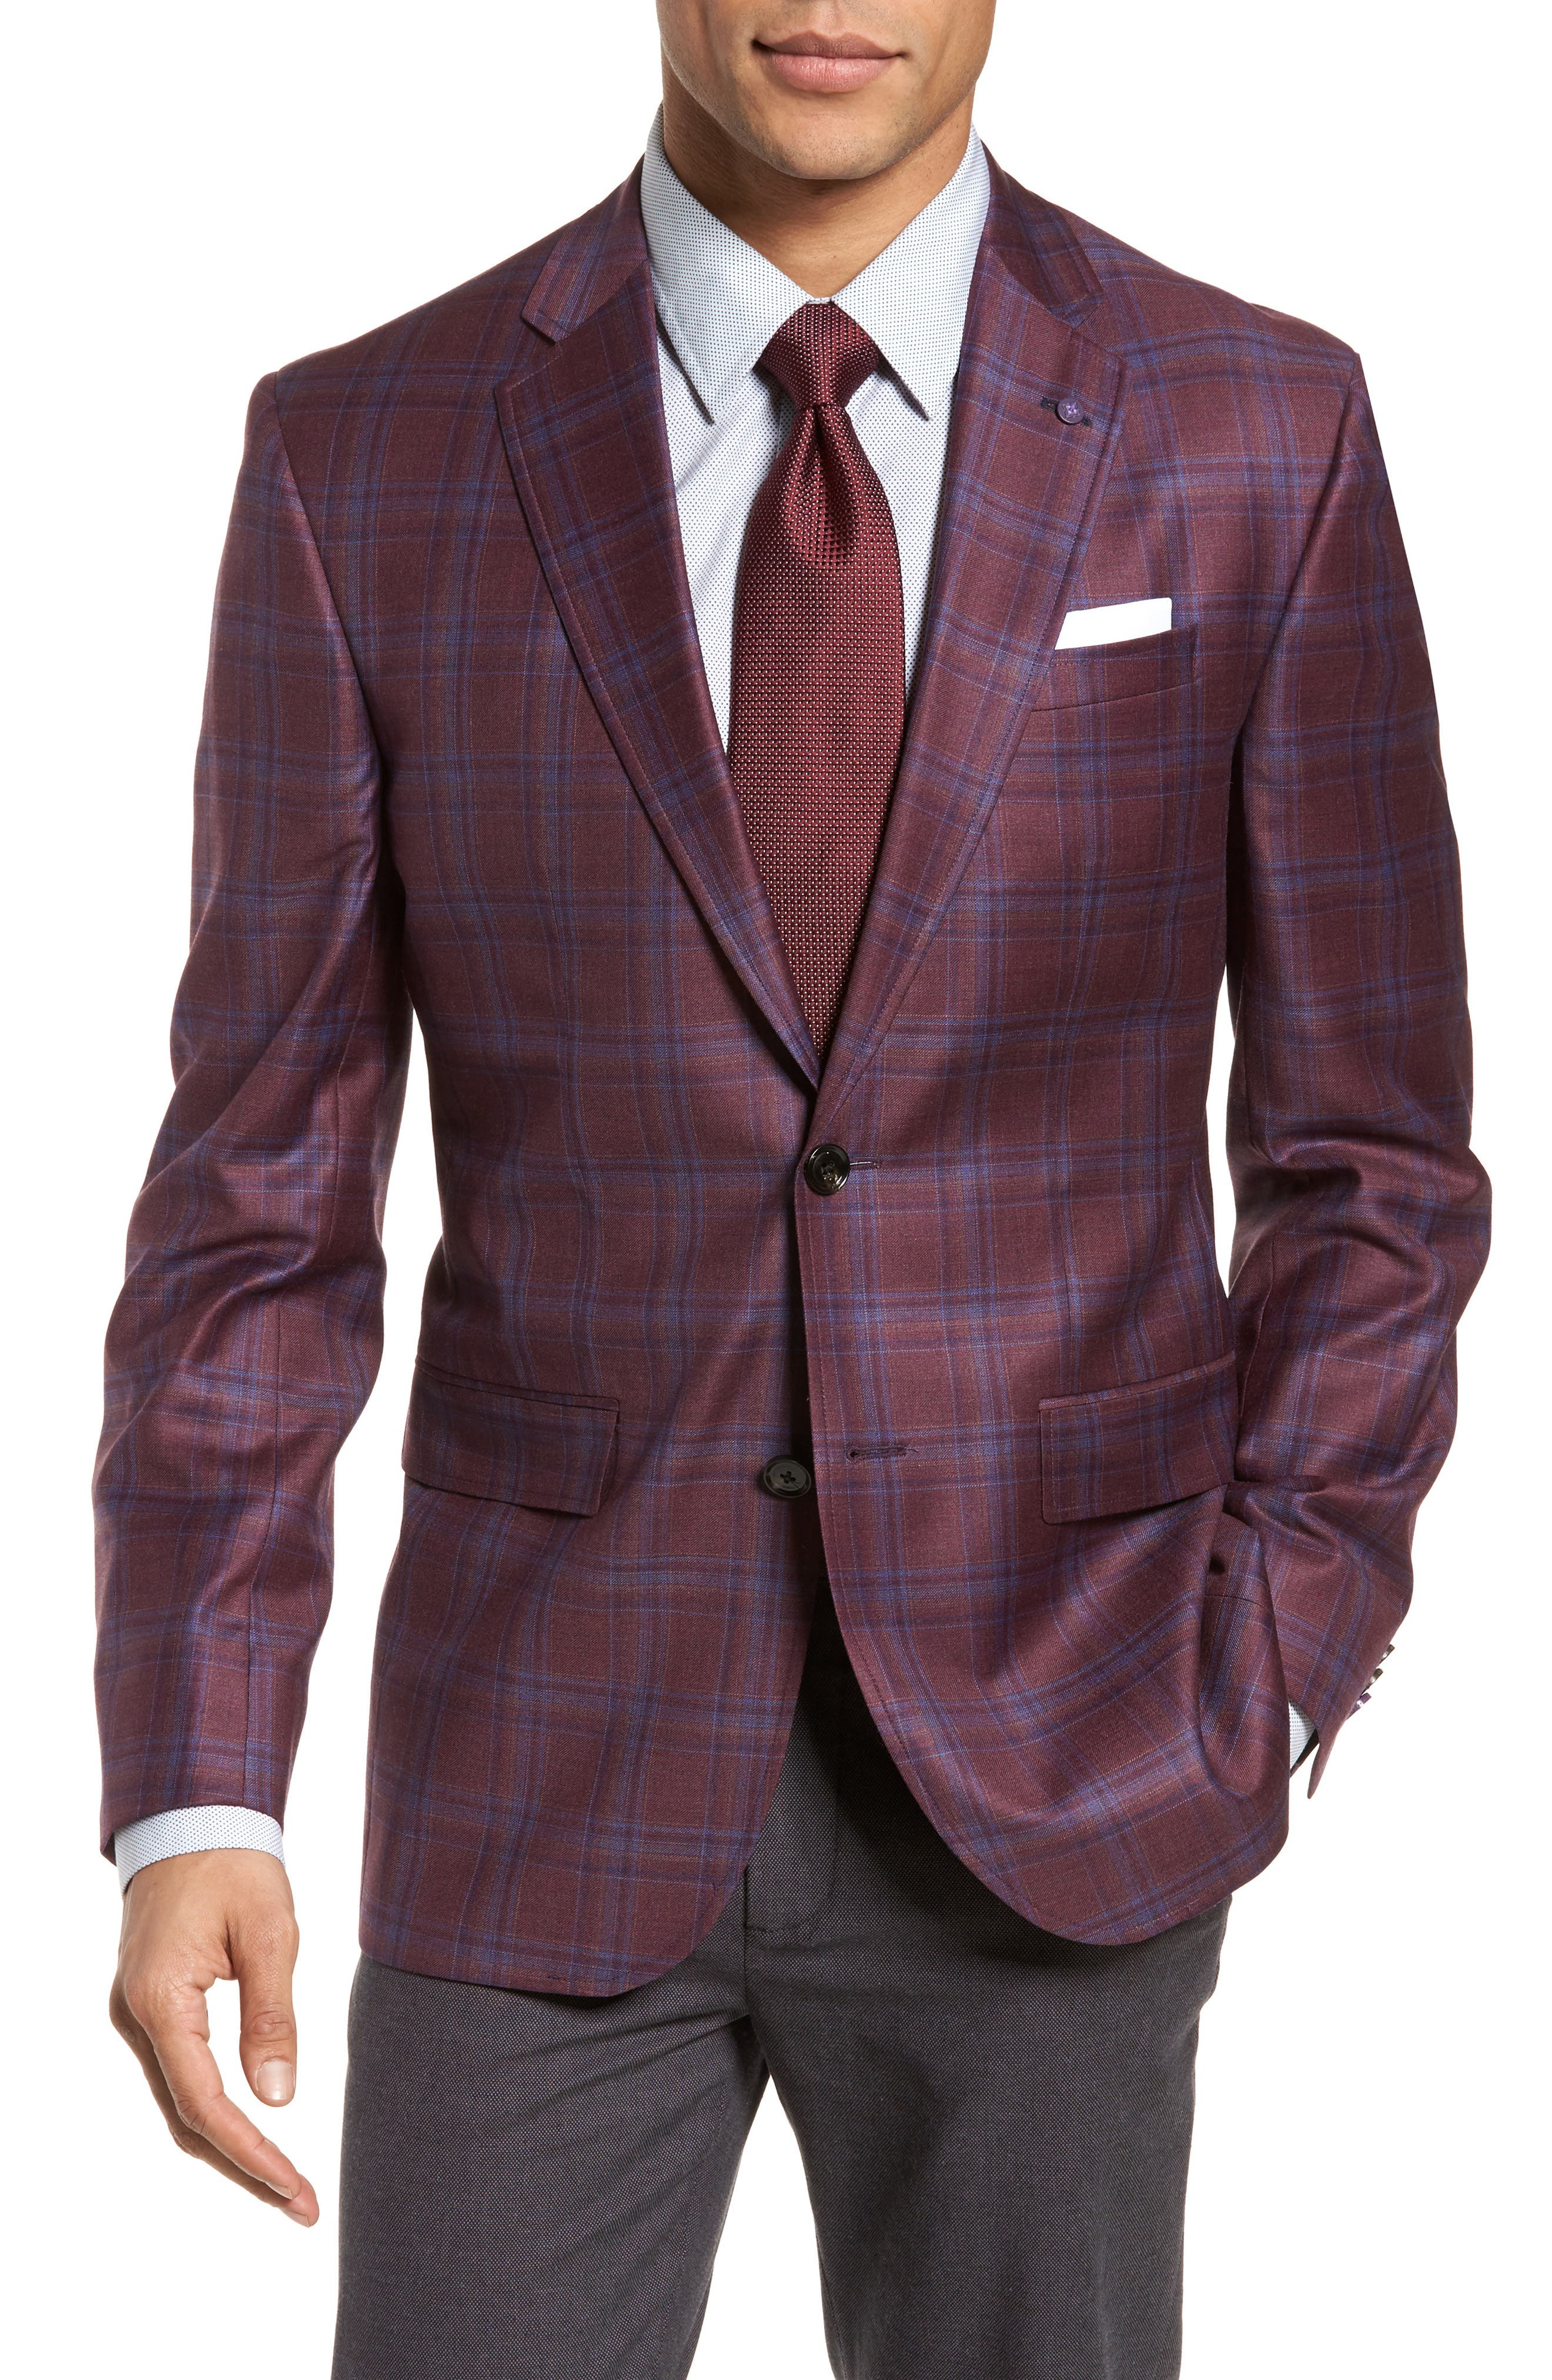 Jay Trim Fit Plaid Wool Sport Coat,                             Main thumbnail 1, color,                             600